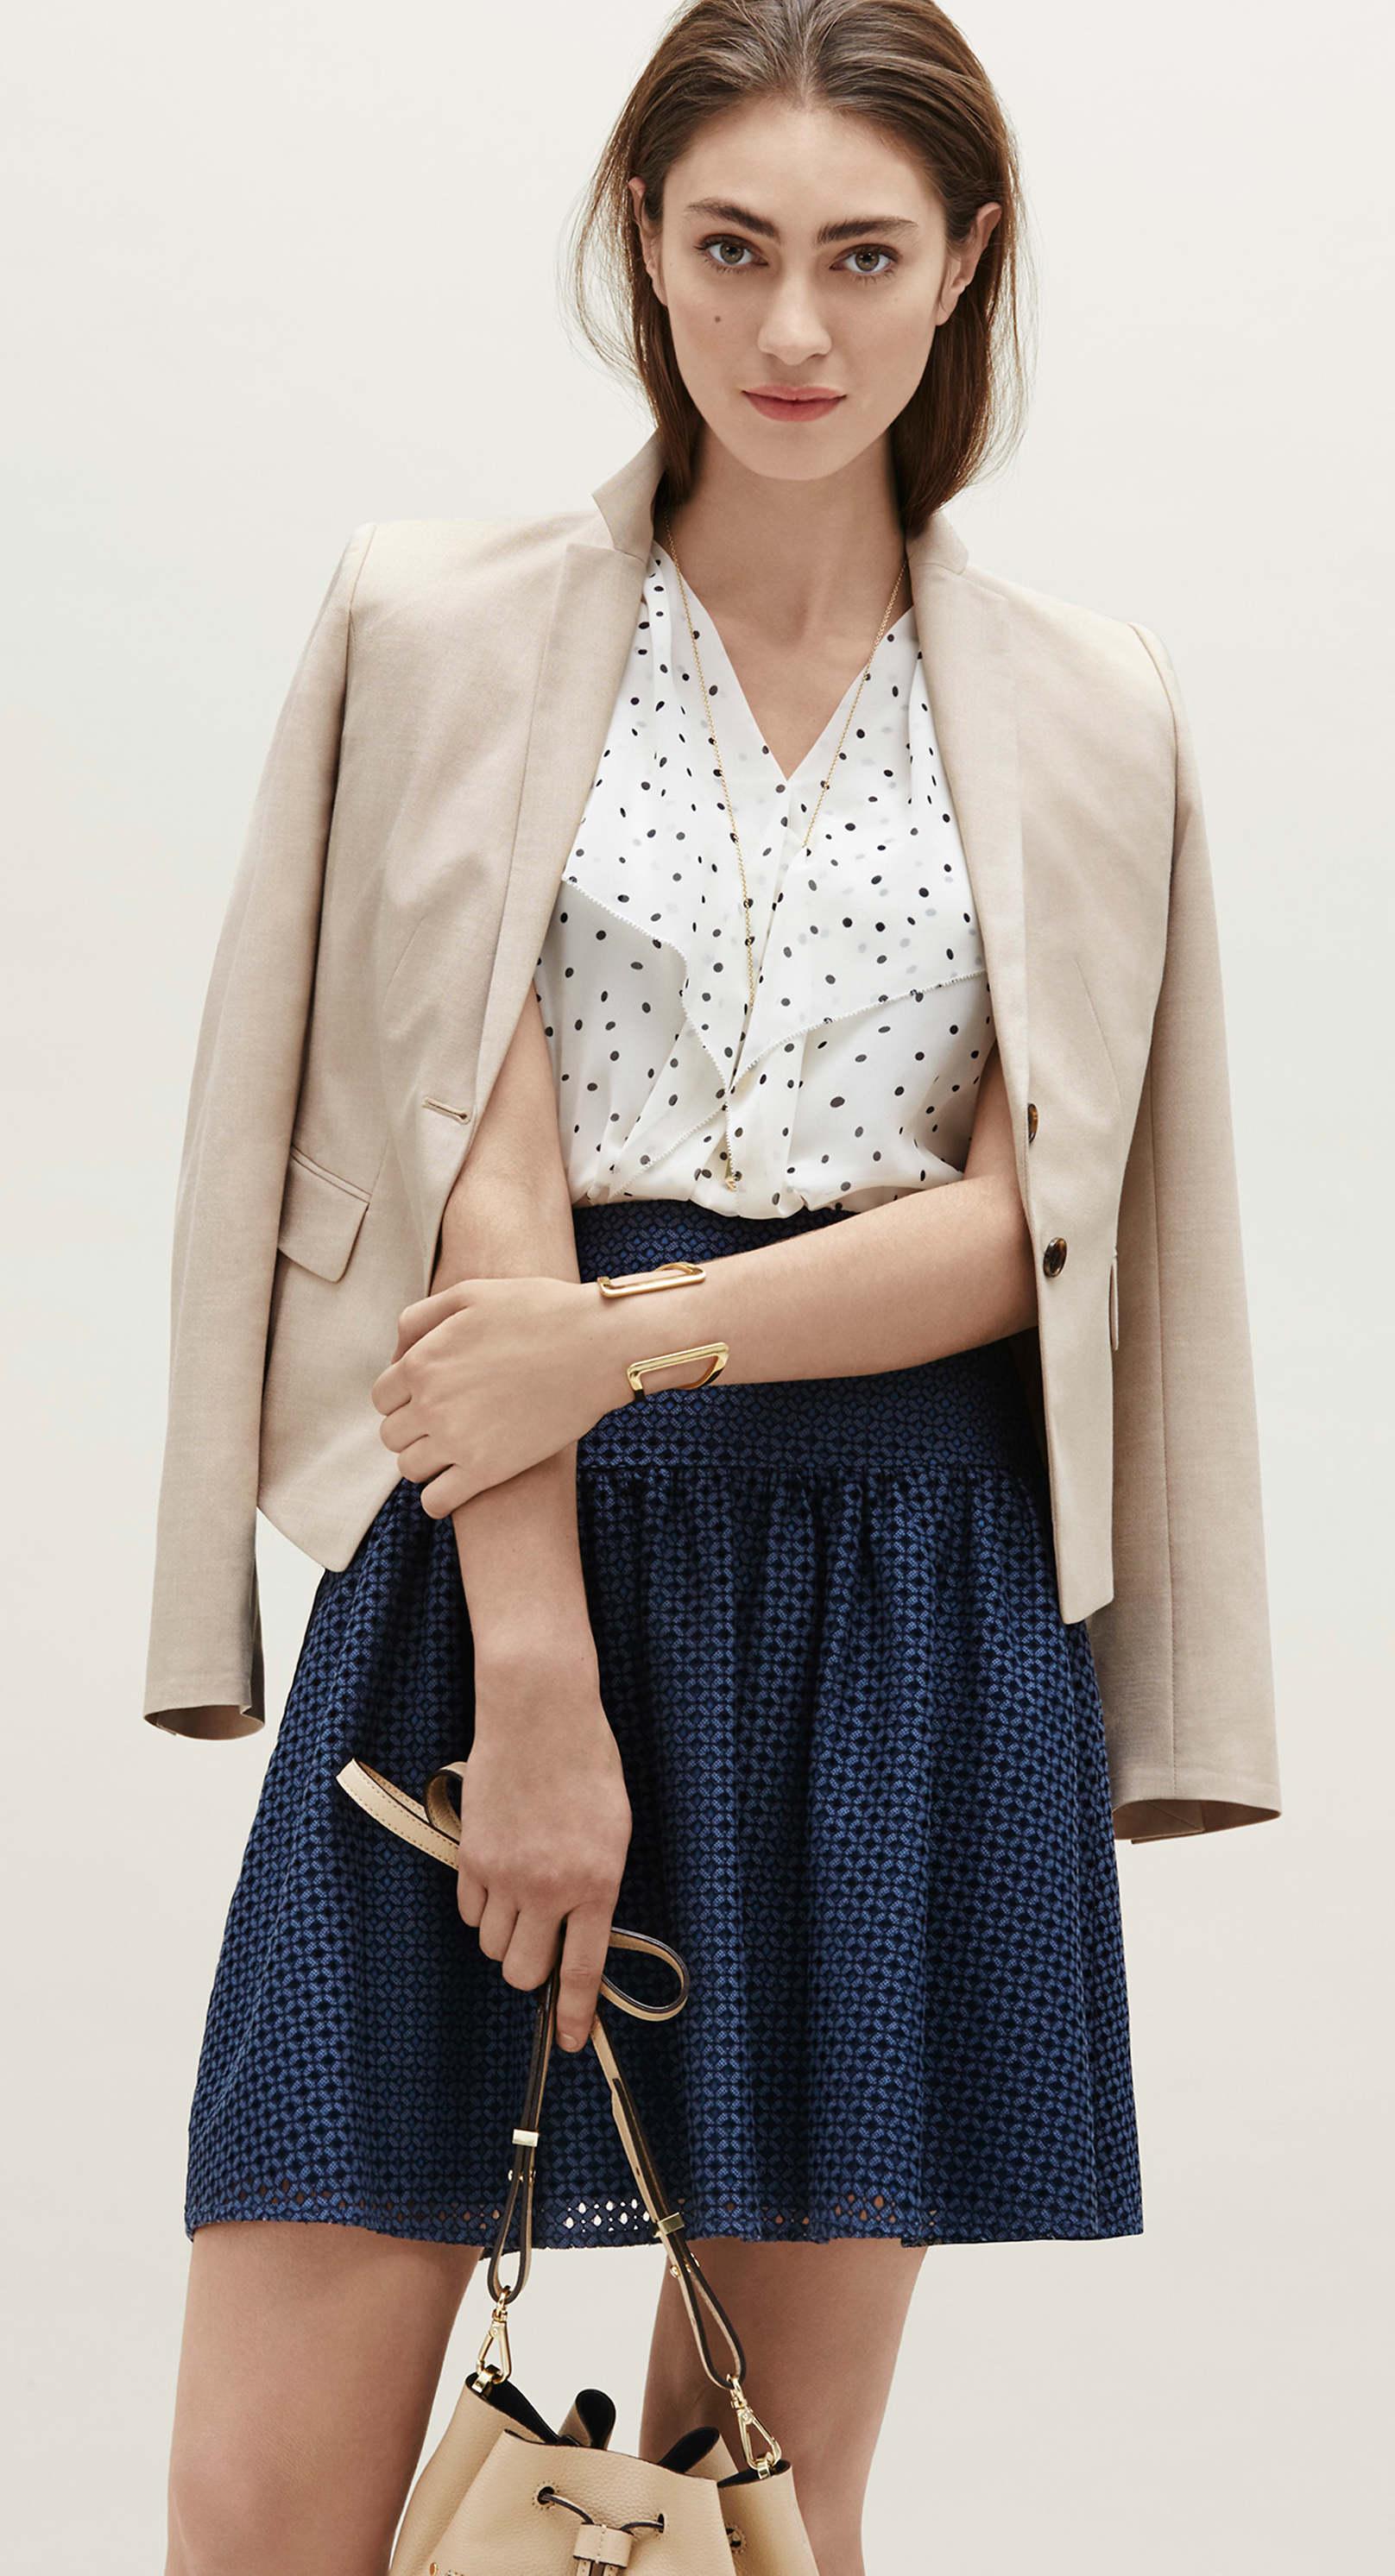 Ann Taylor Textured Swing Skirt